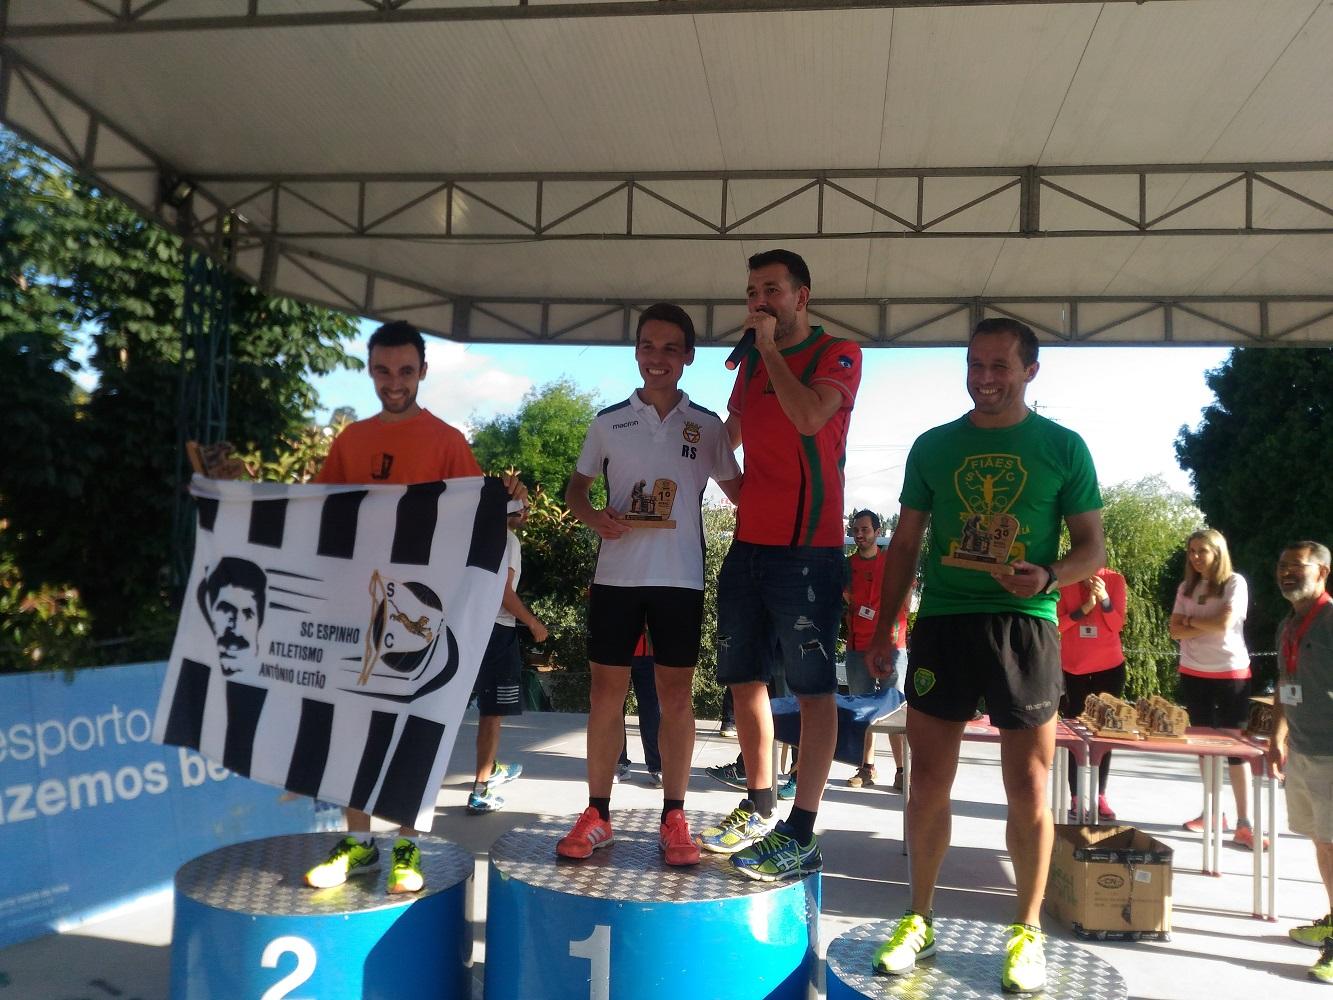 Pódio Vencedor 4º Grande Prémio Atletismo Santa Maria de Lamas 2018